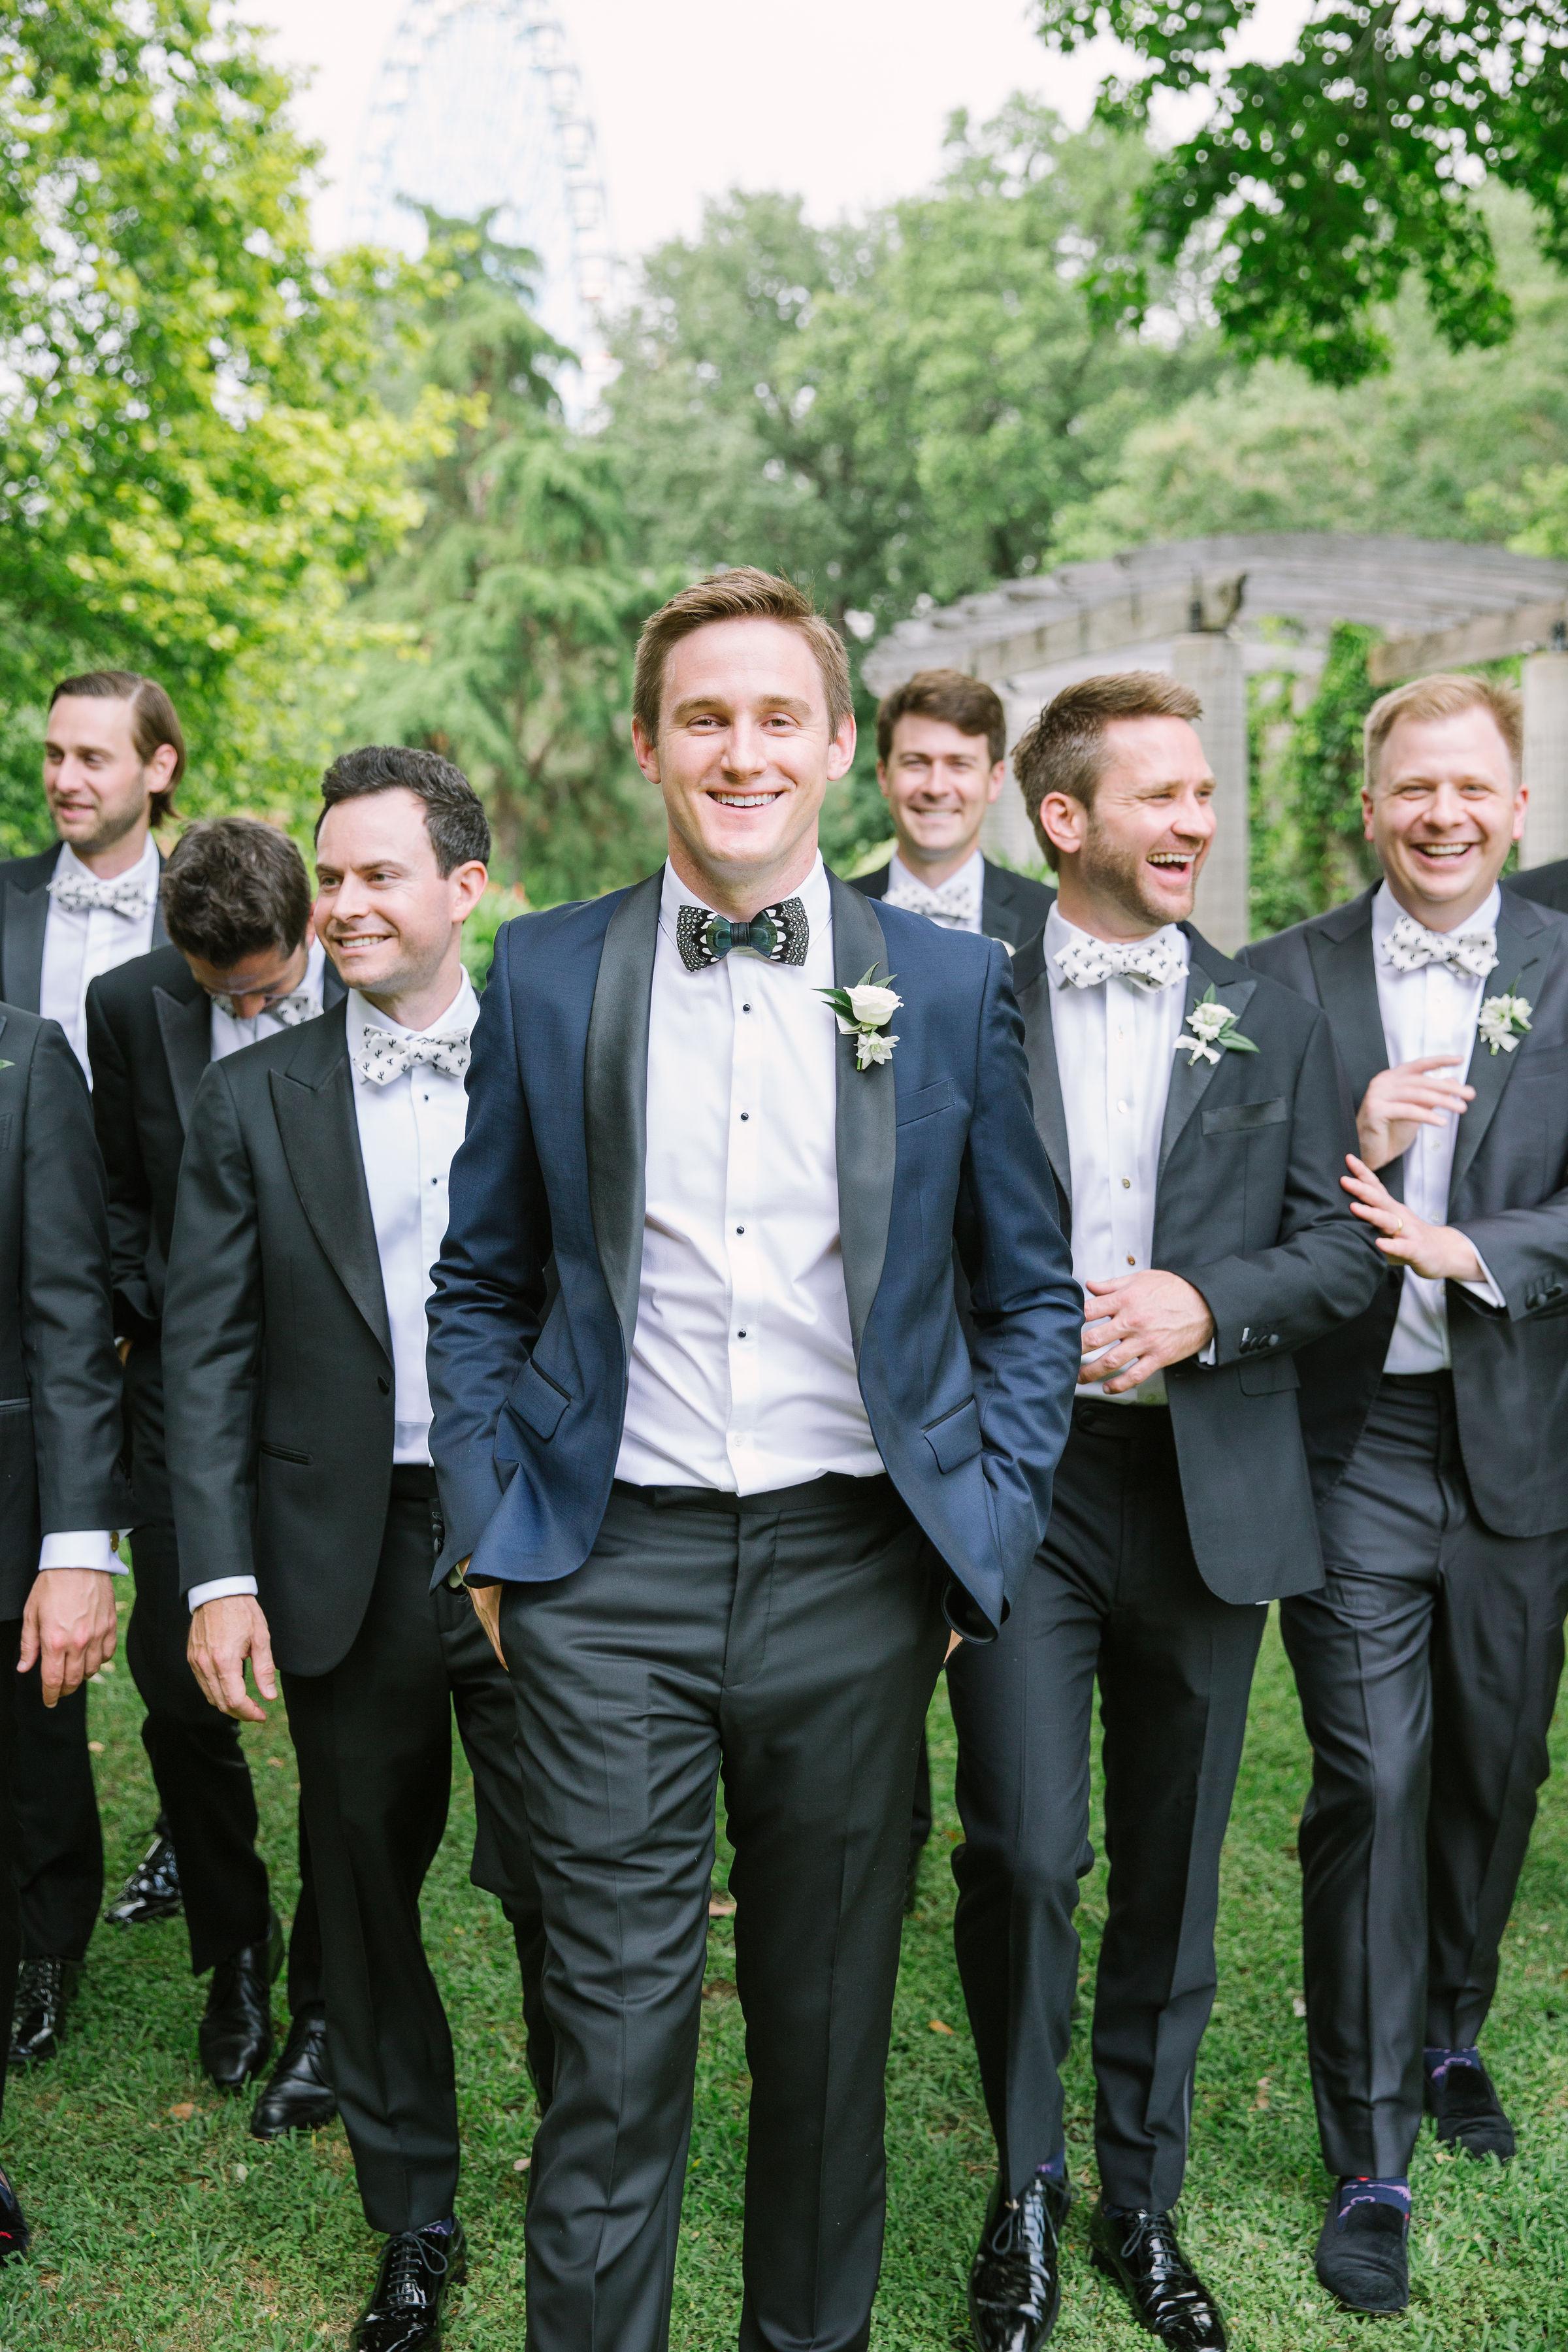 Ellen-Ashton-Photography-Dallas-Wedding-Photographers-Ivory-and-vine-Weddings-802.jpg